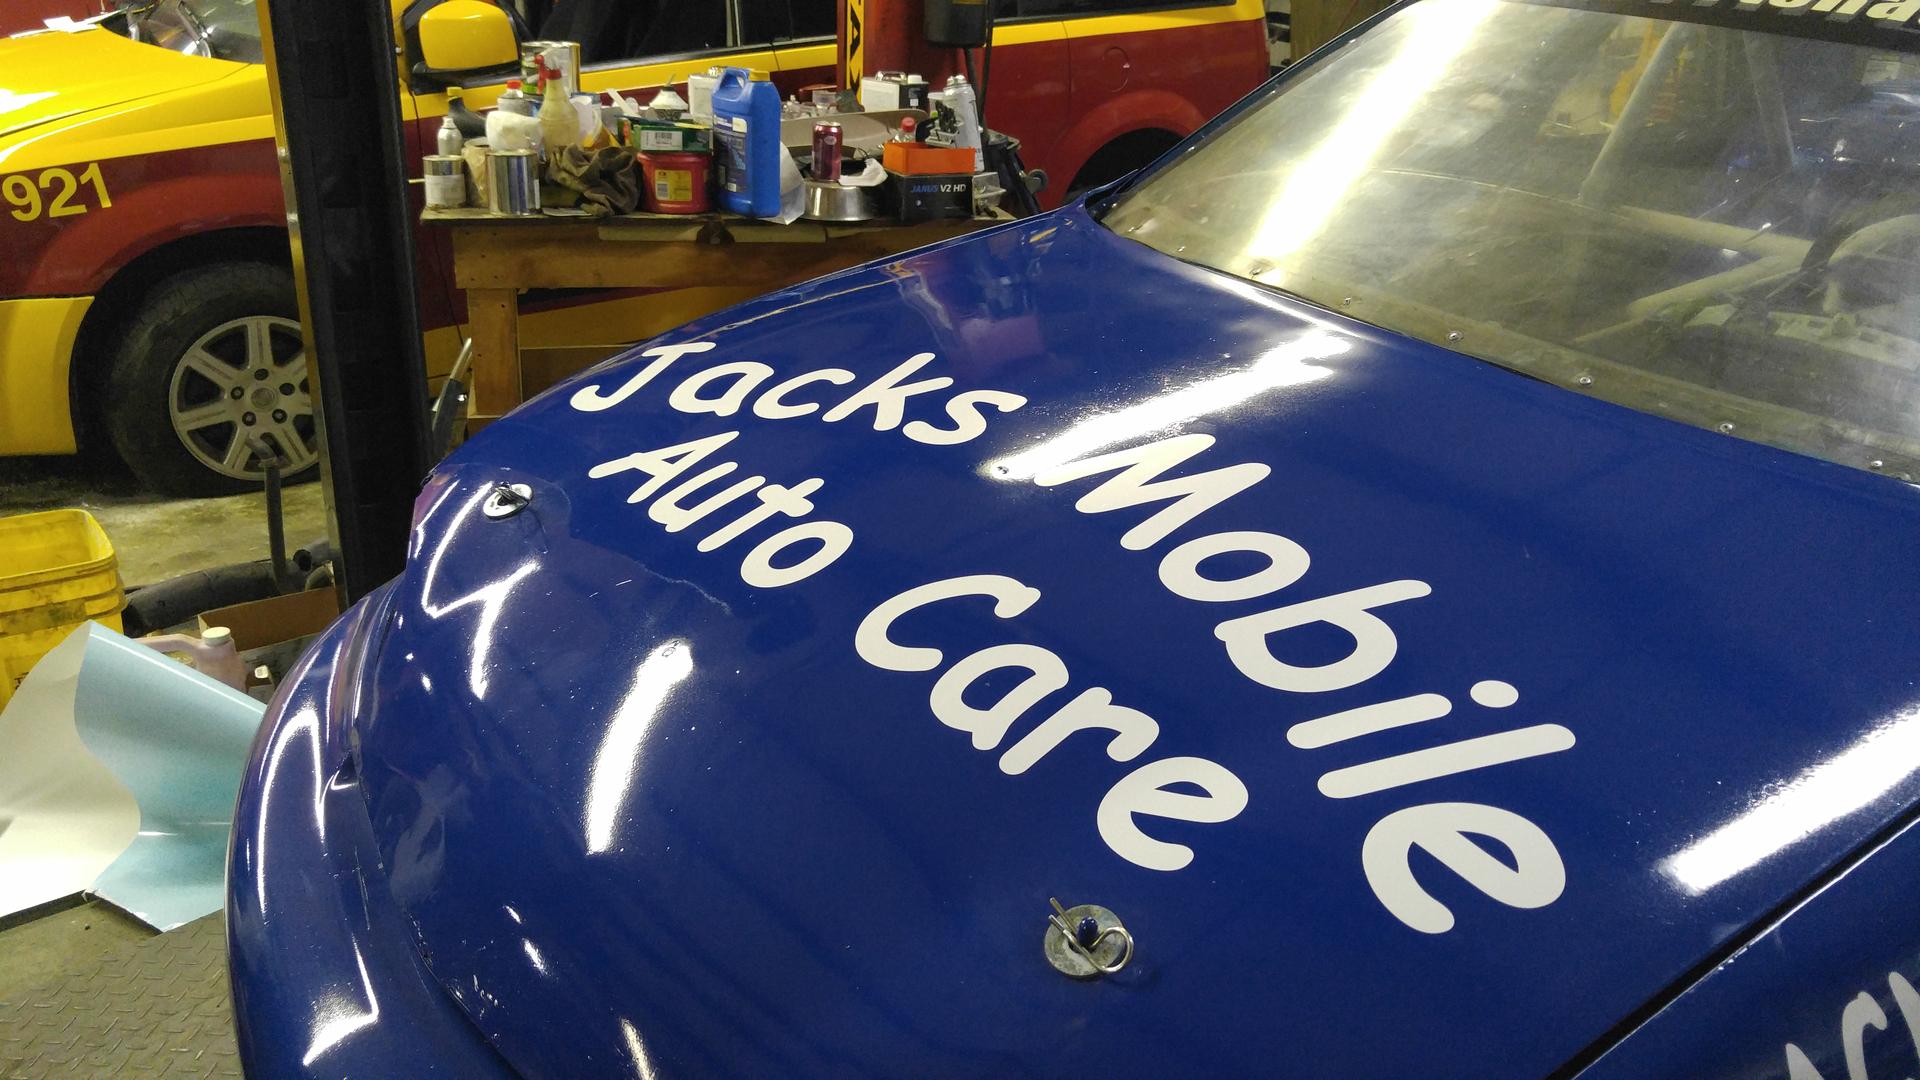 Jacks Mobile Auto Care